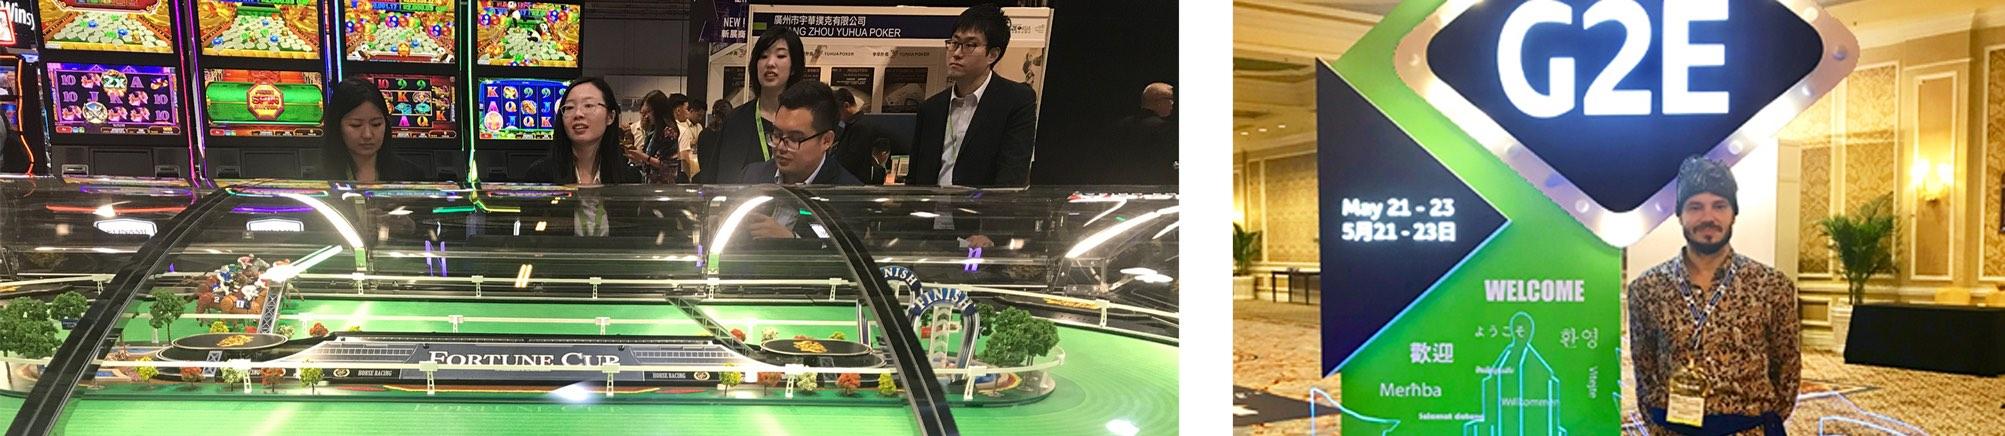 SmartCasinoGuide G2E veebimängude konverentsil